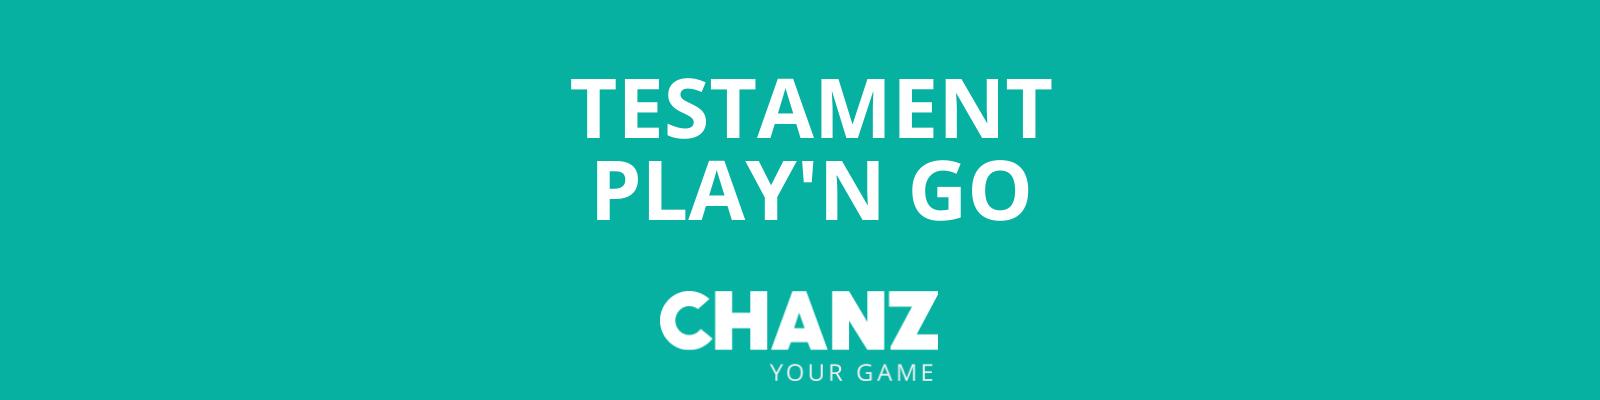 Testament Play'n Go